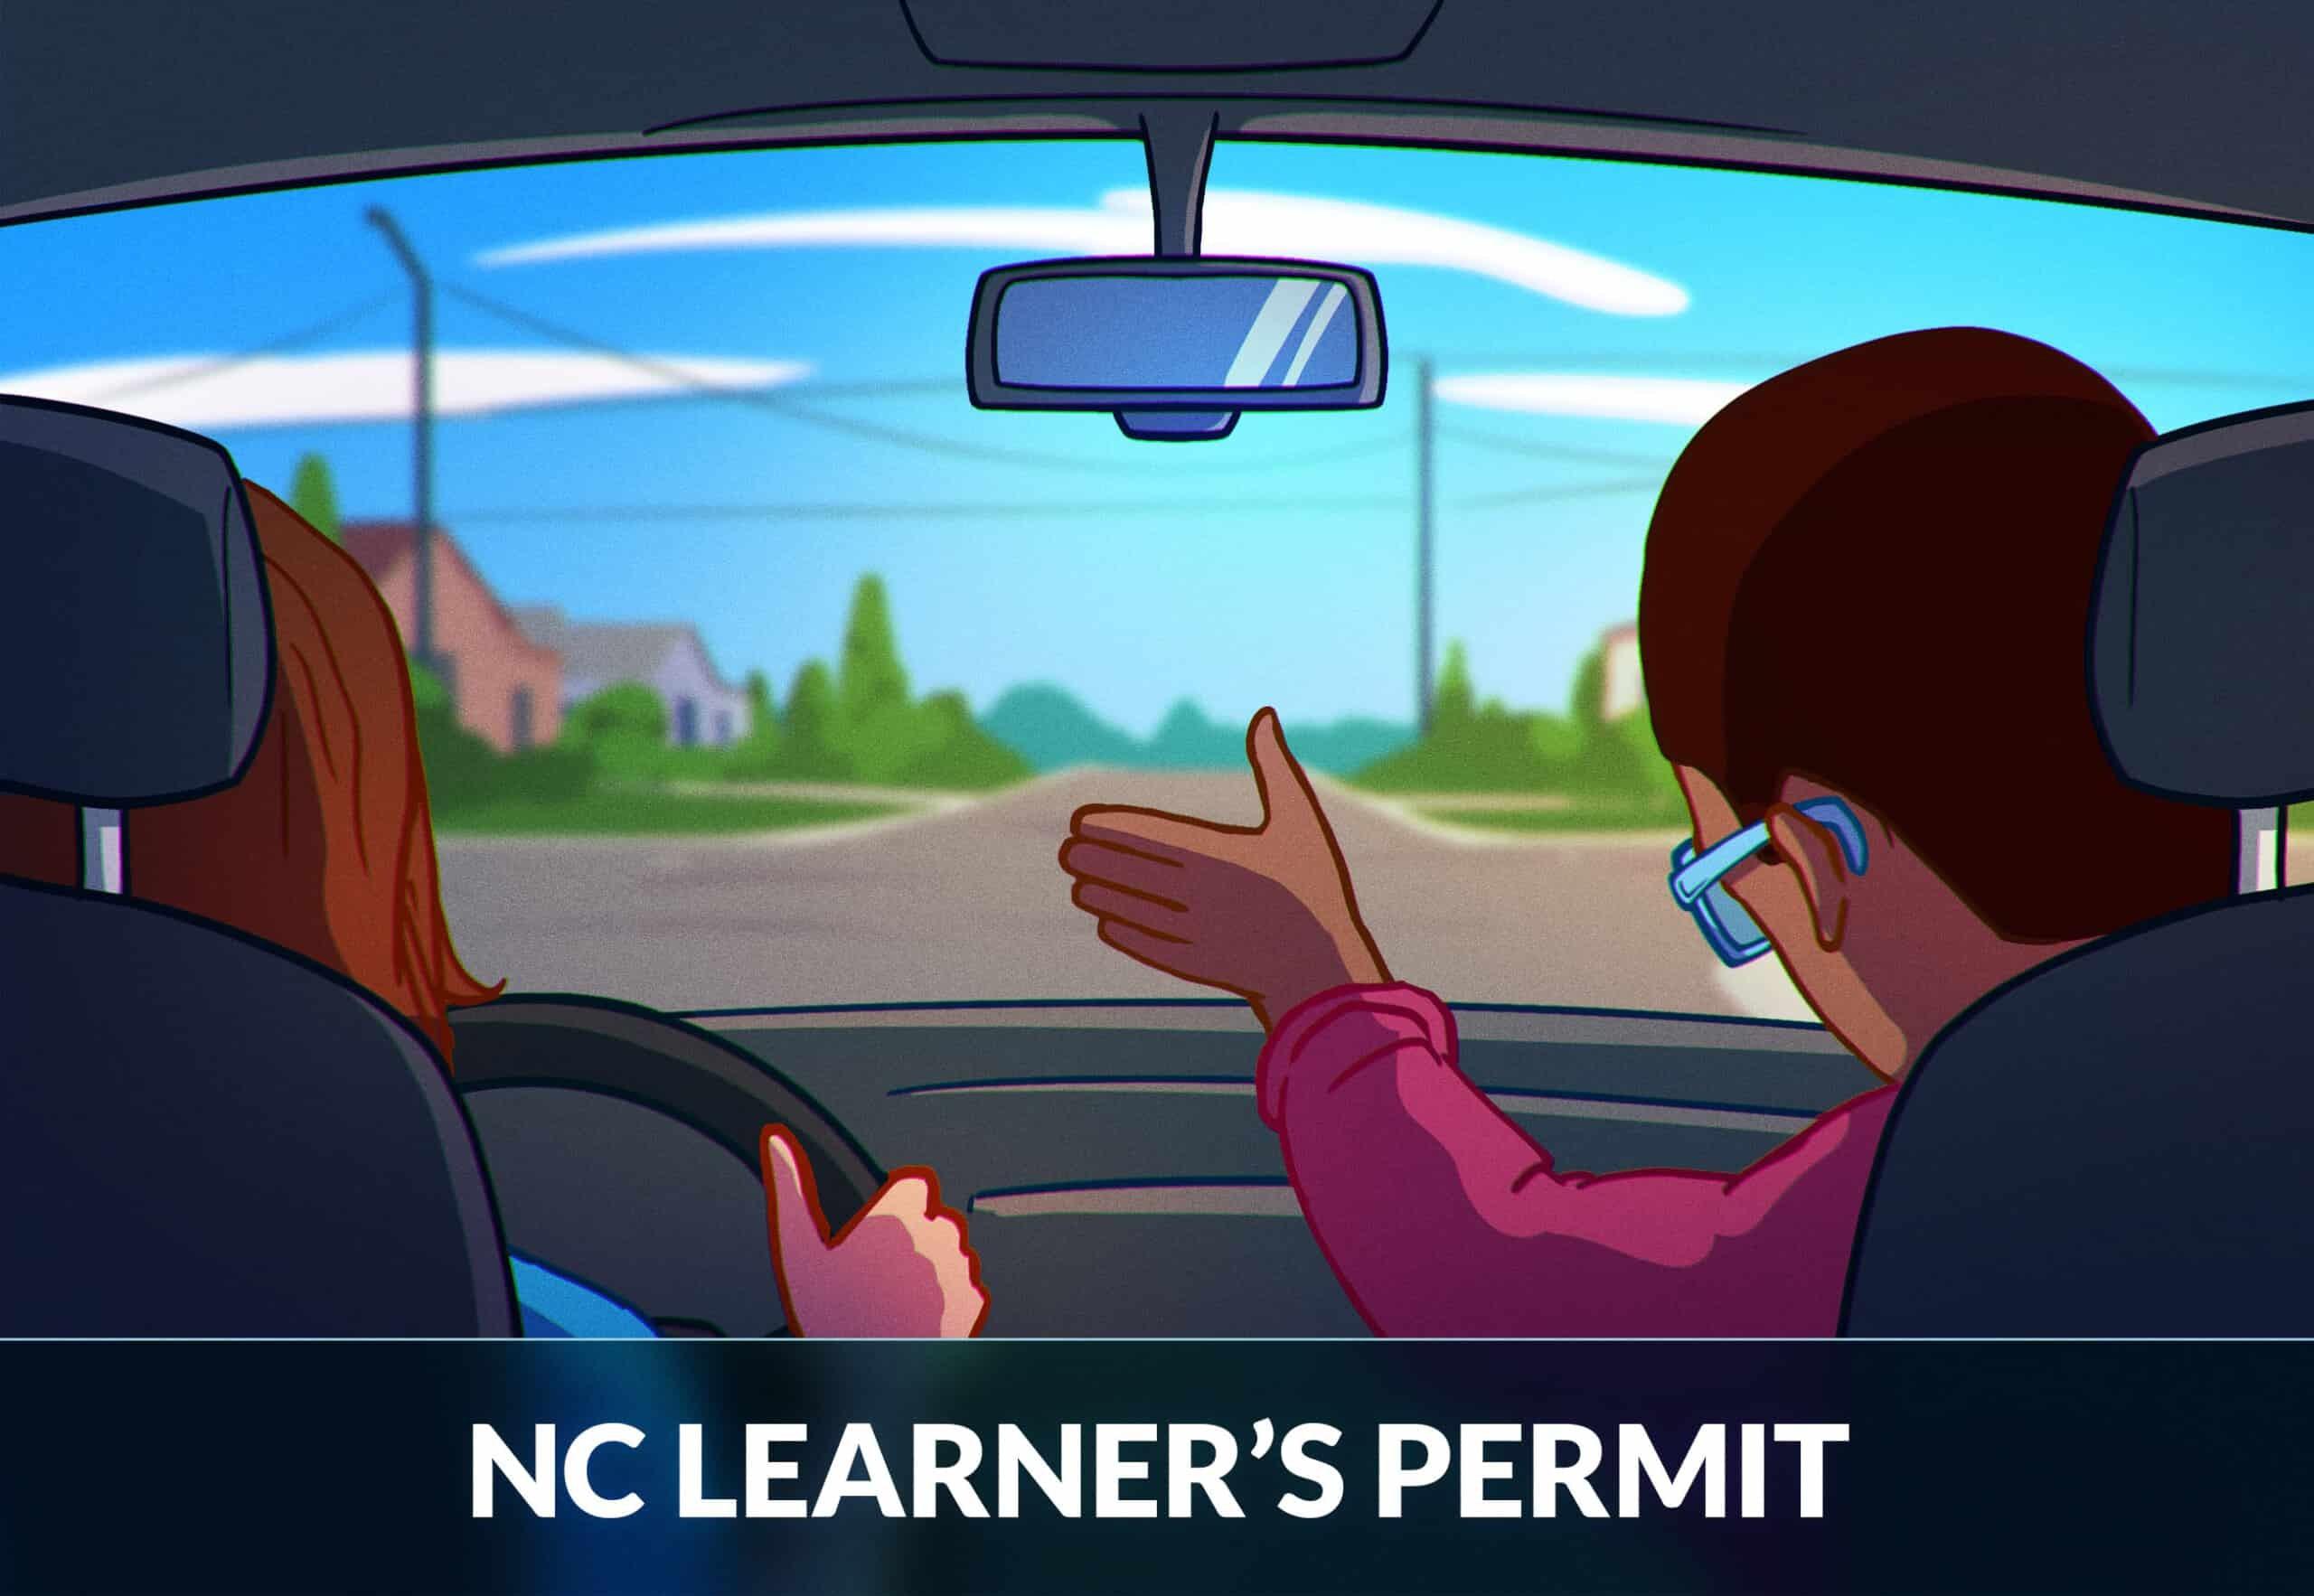 North Carolina (NC) Learner's Permit